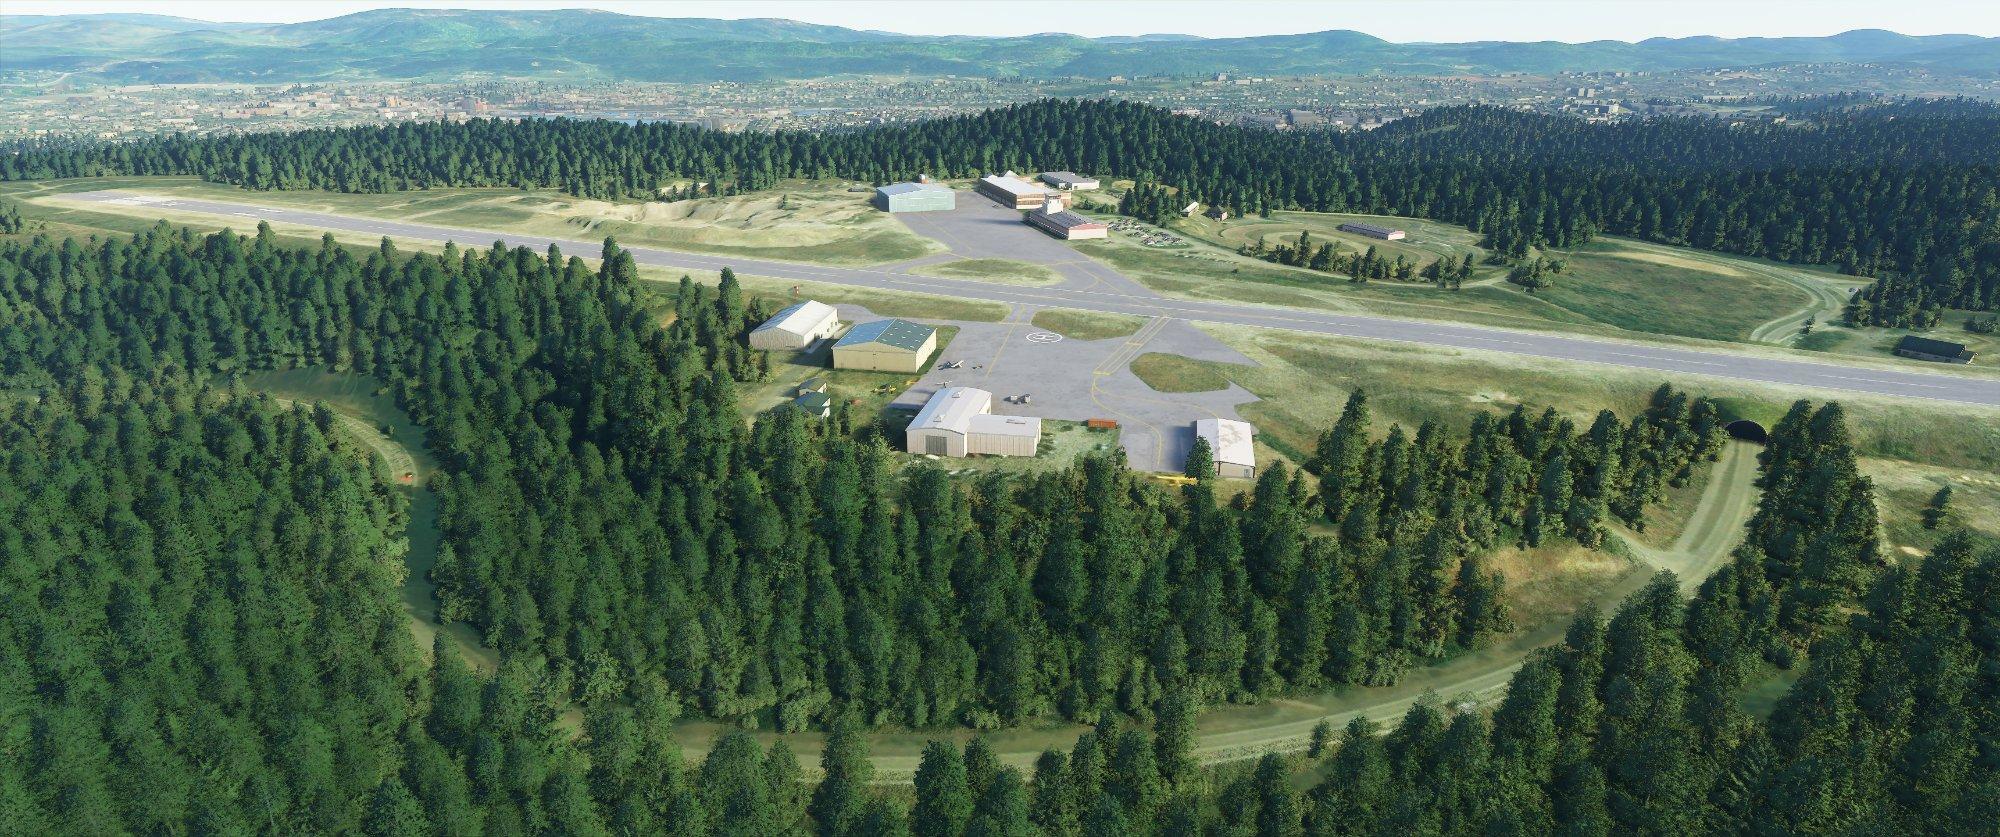 Microsoft Flight Simulator Screenshot 2020.10.27 - 18.38.59.01.jpg